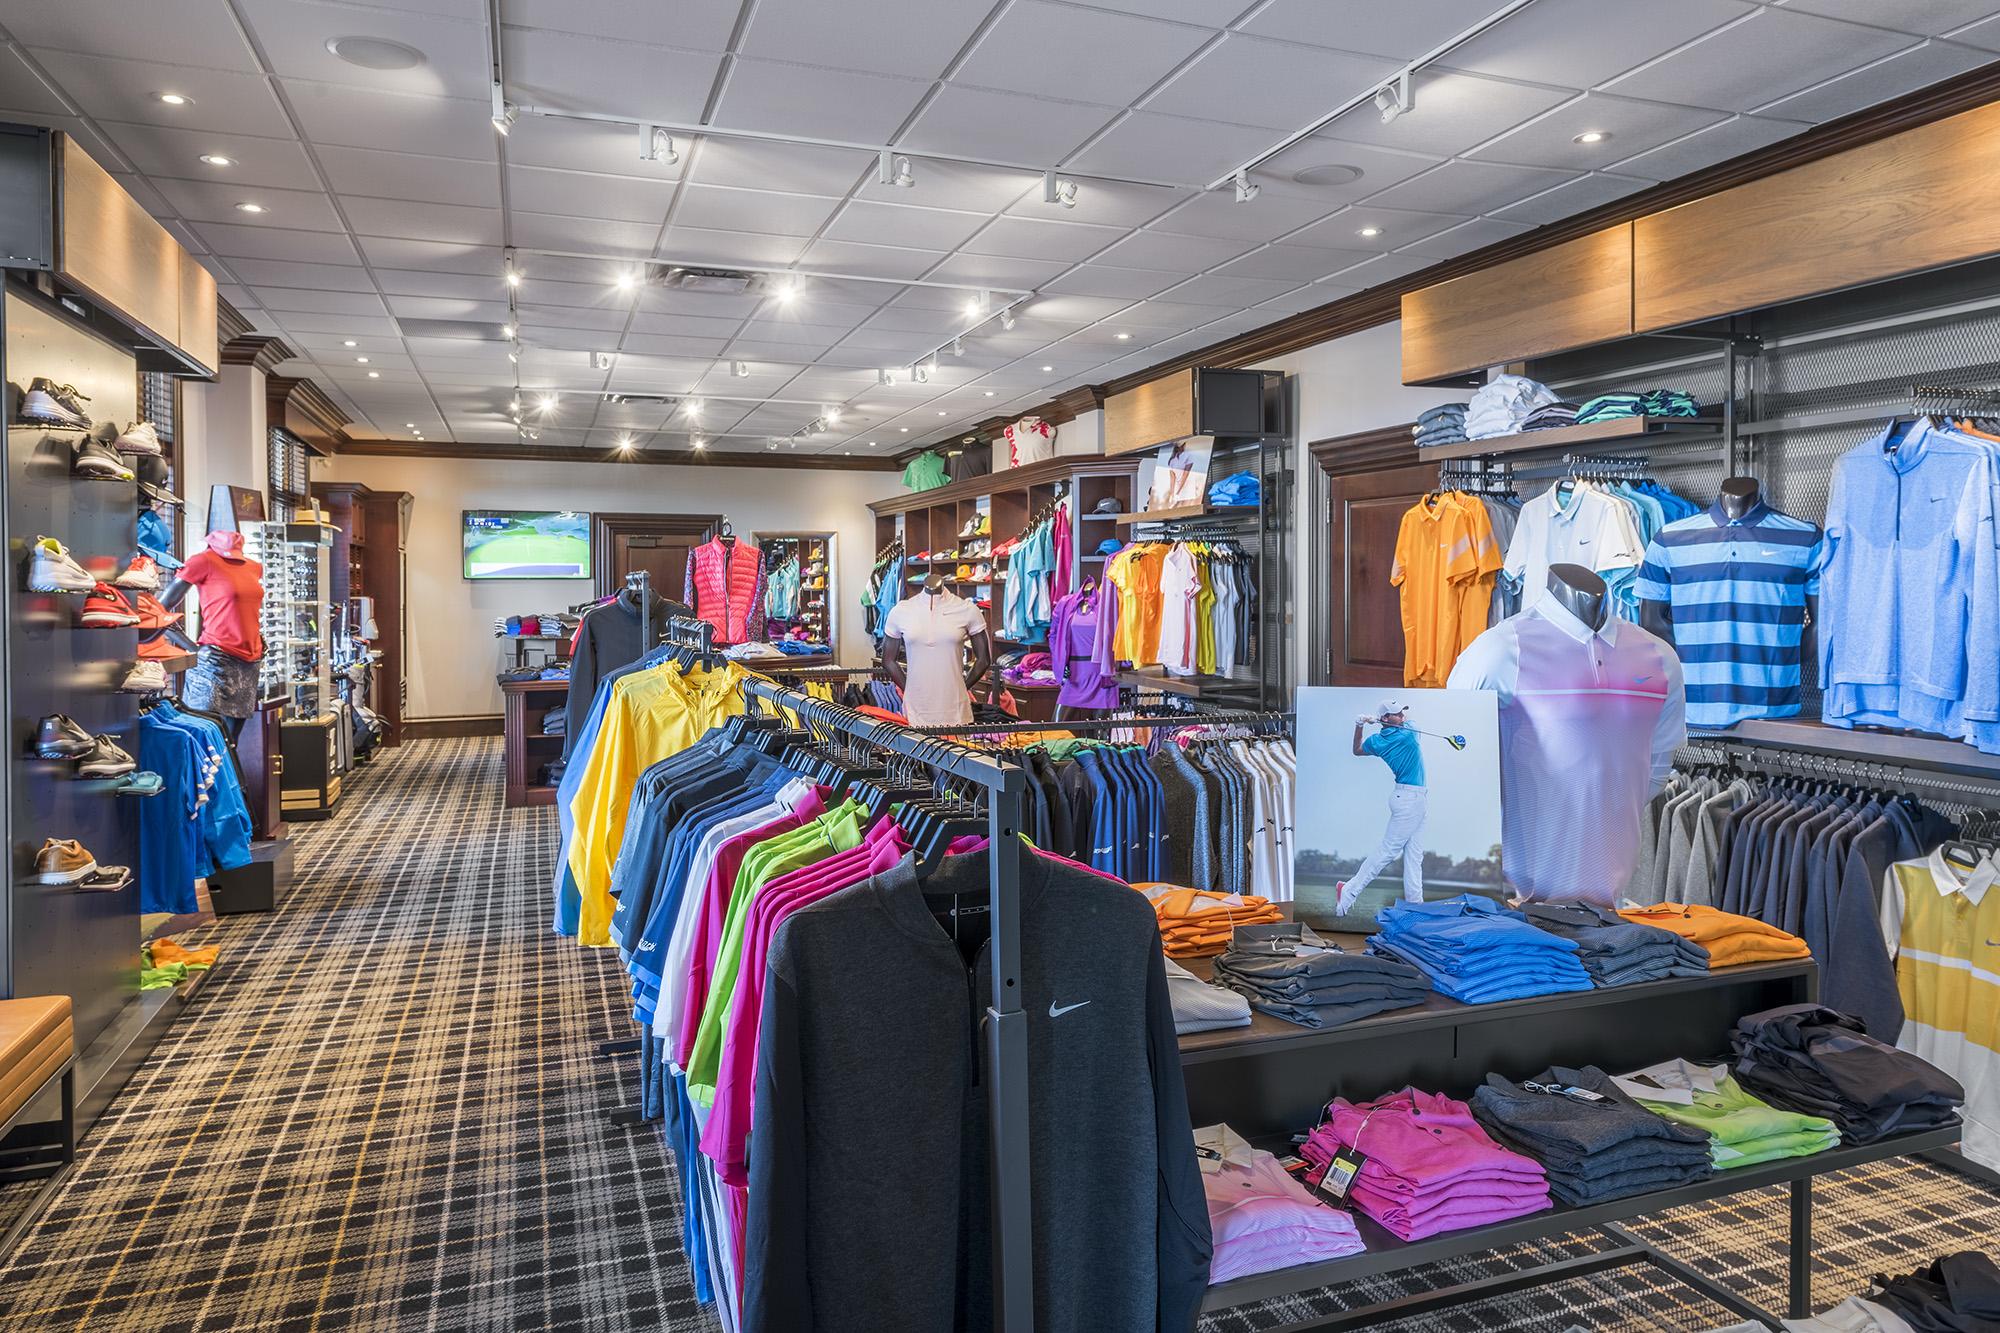 fox harb 39 r resort golf pro shop call 1 866 257 1801. Black Bedroom Furniture Sets. Home Design Ideas